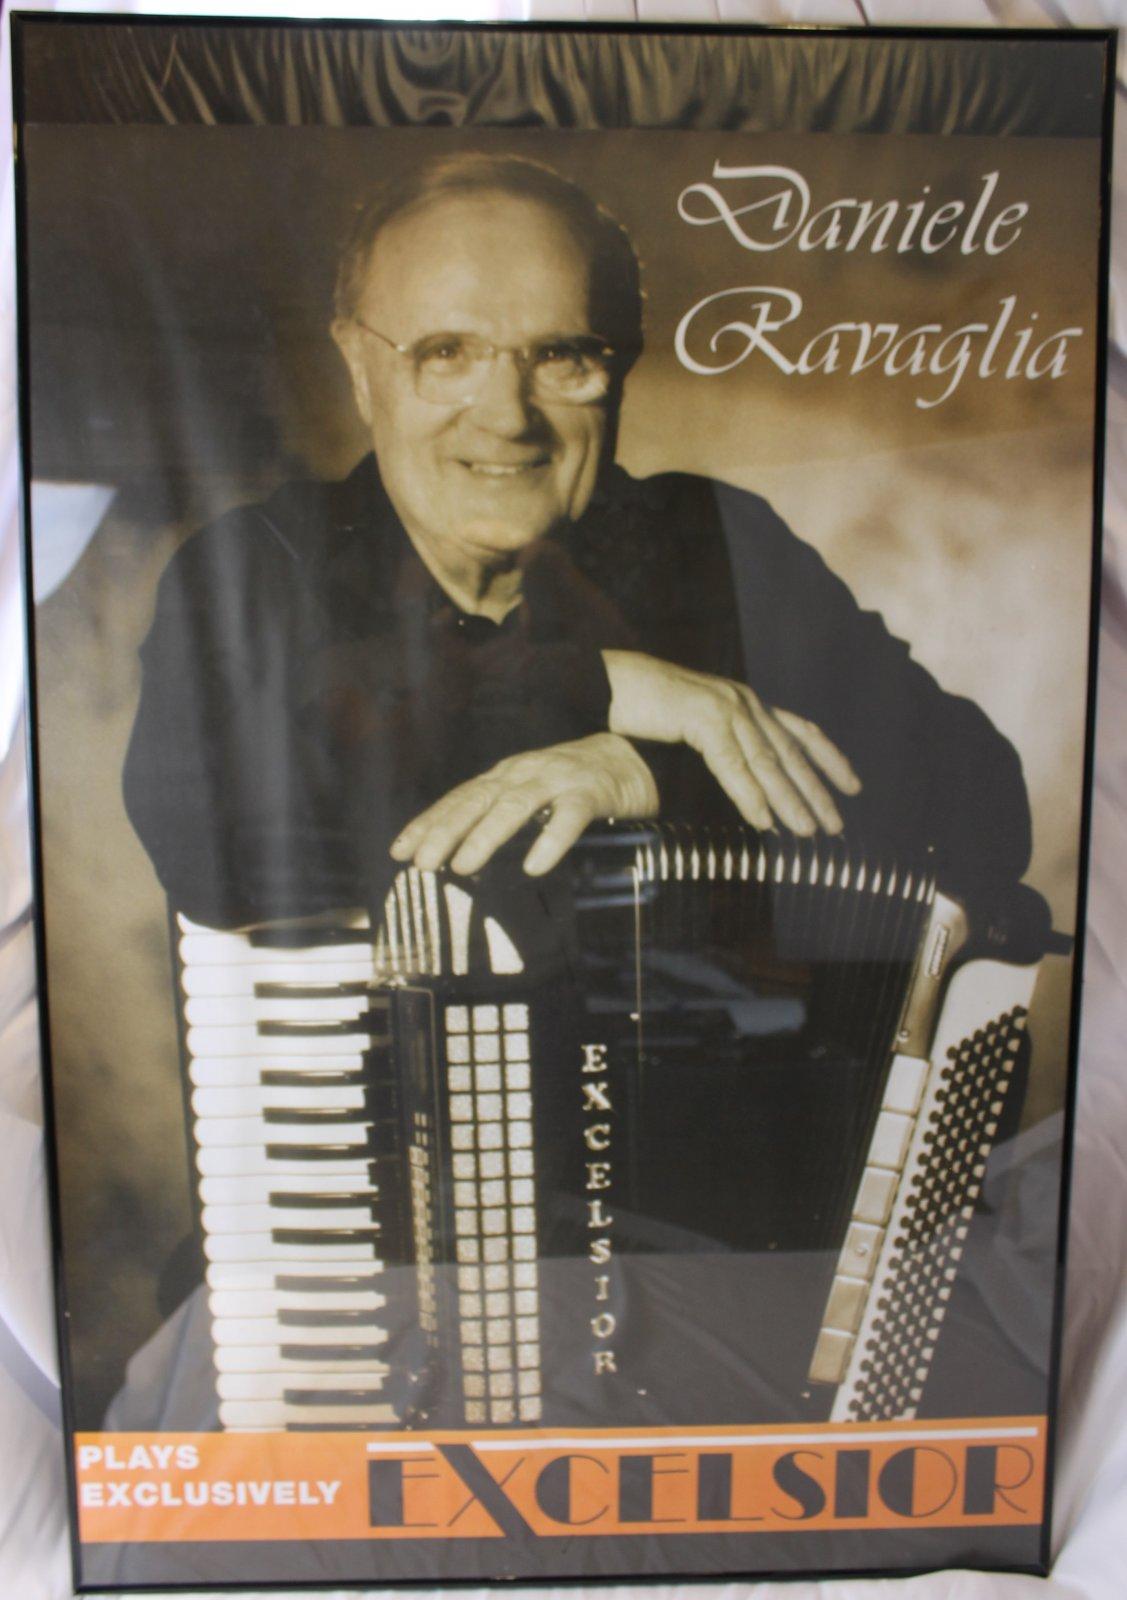 41 x 27 Framed Poster - Daniele Ravaglia, Excelsior